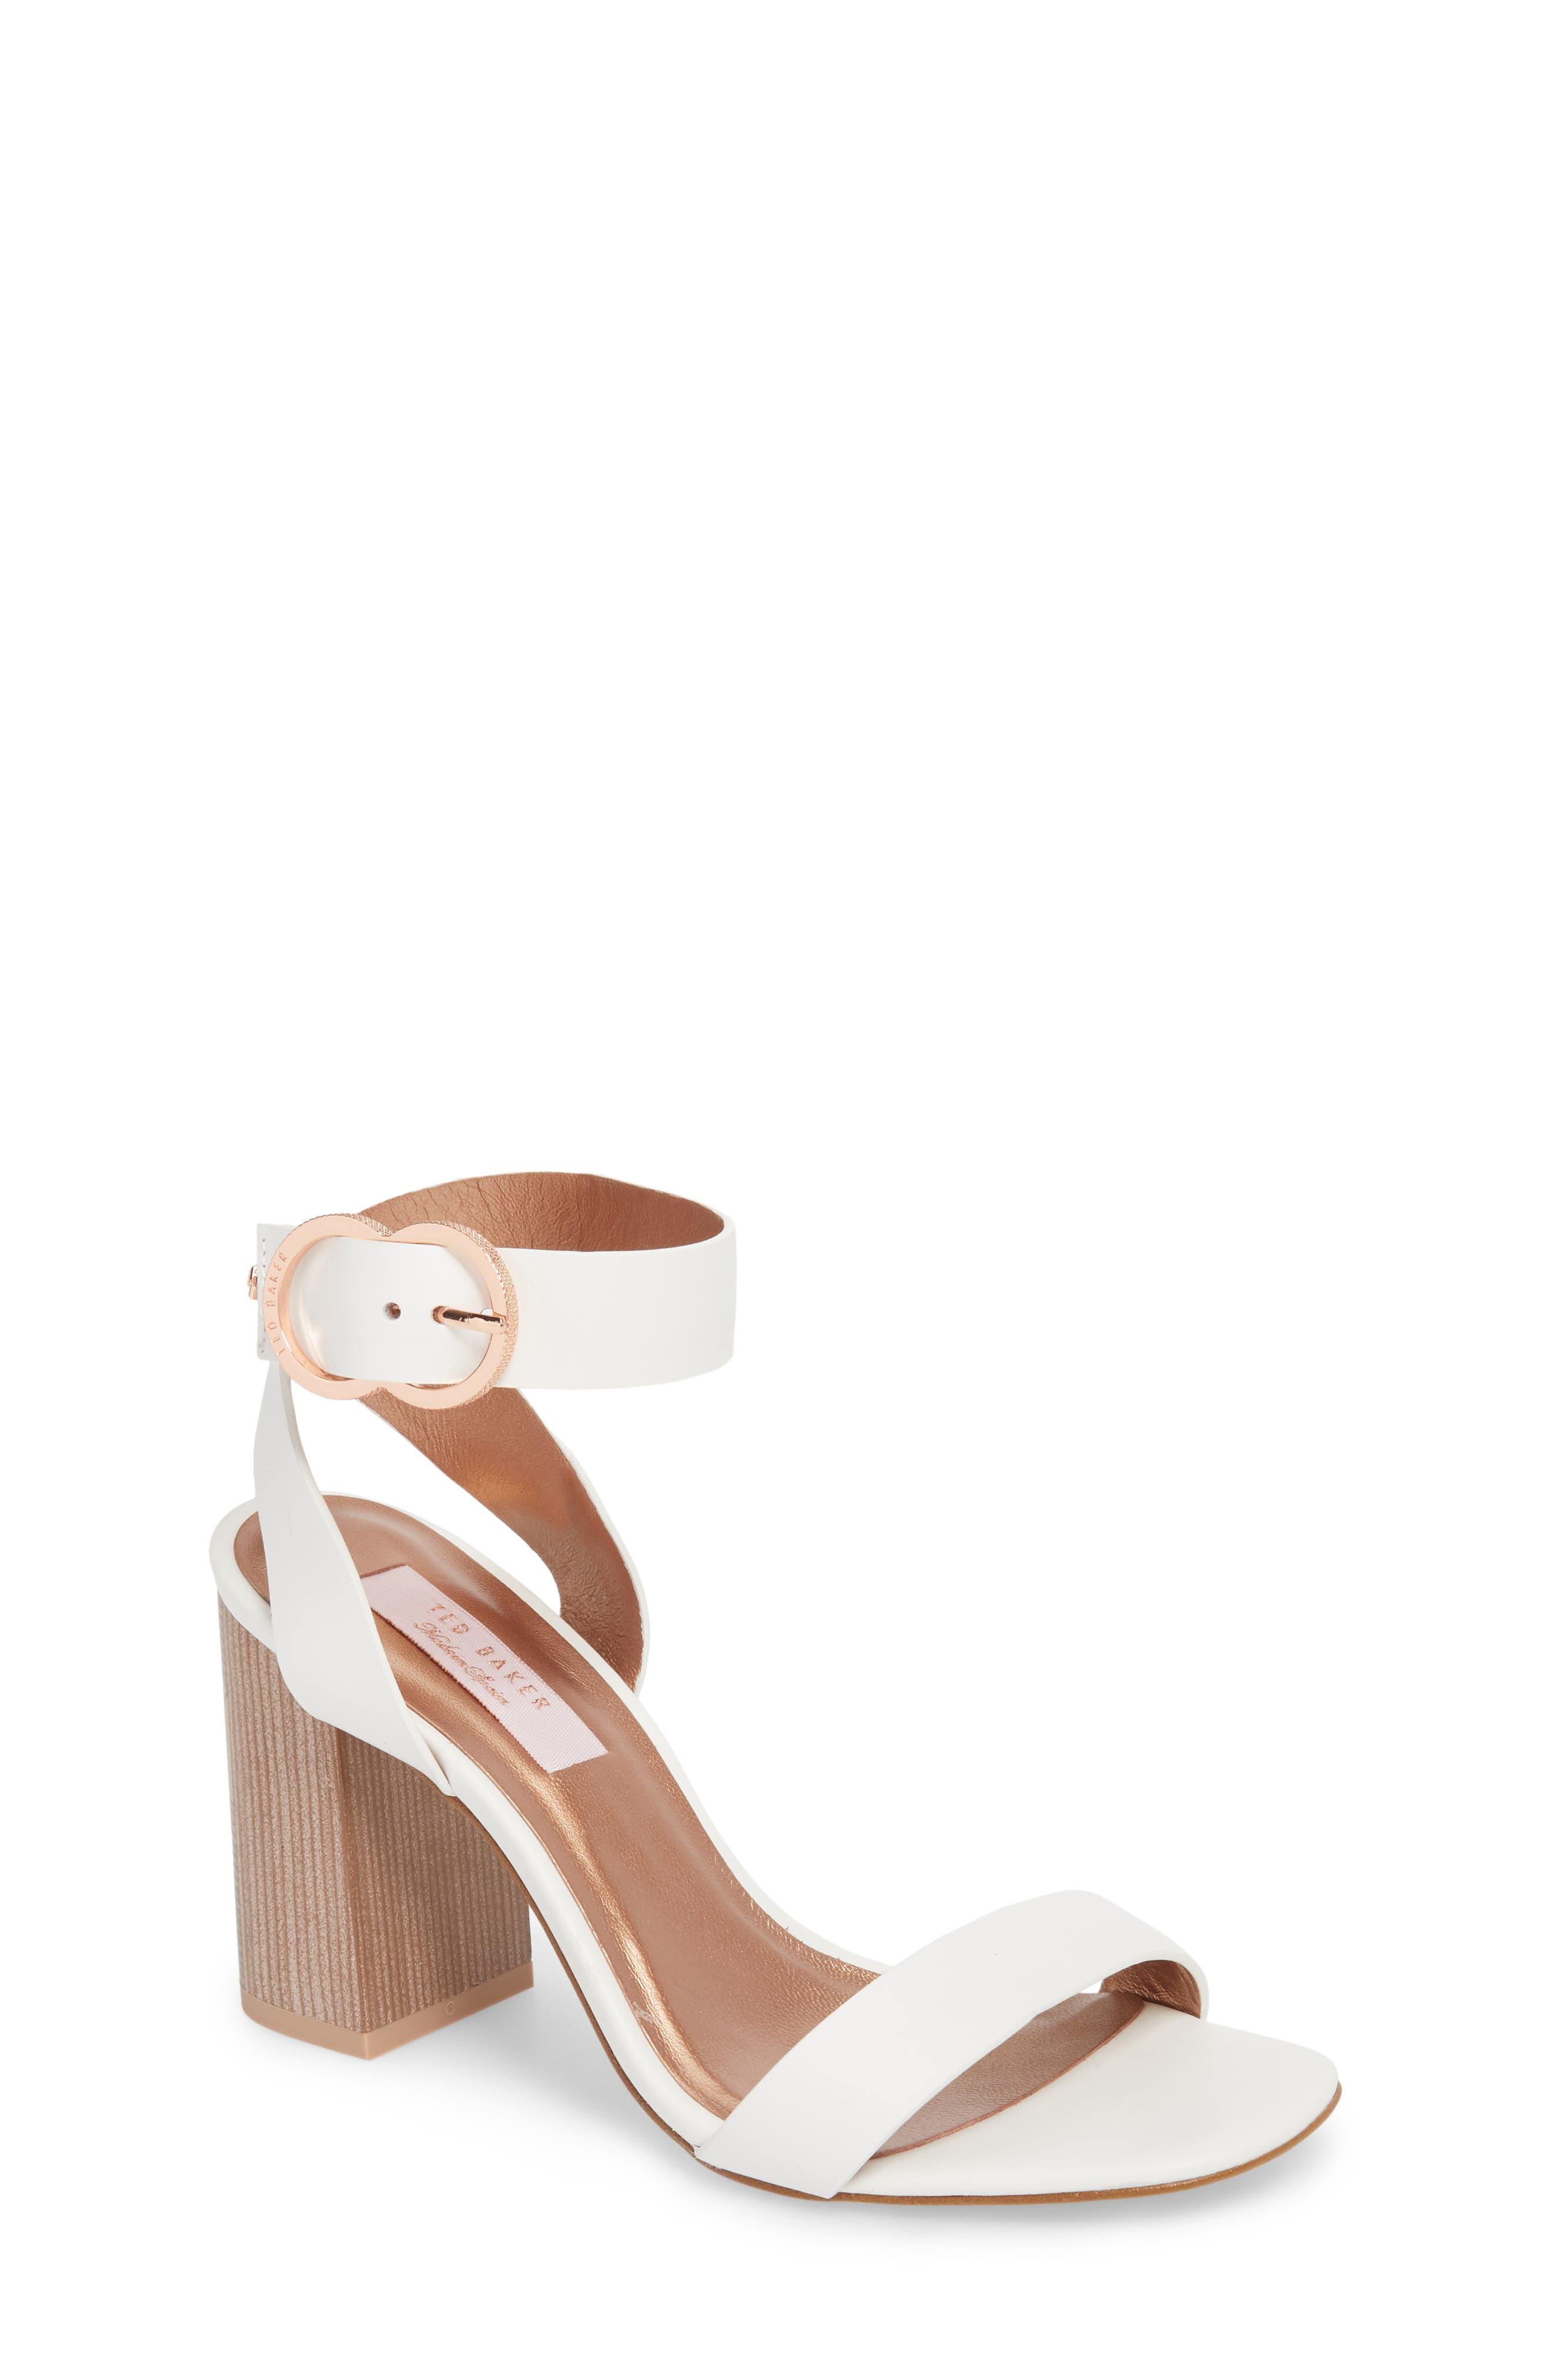 Vallama Block Heel Sandal,                         Main,                         color, White Leather